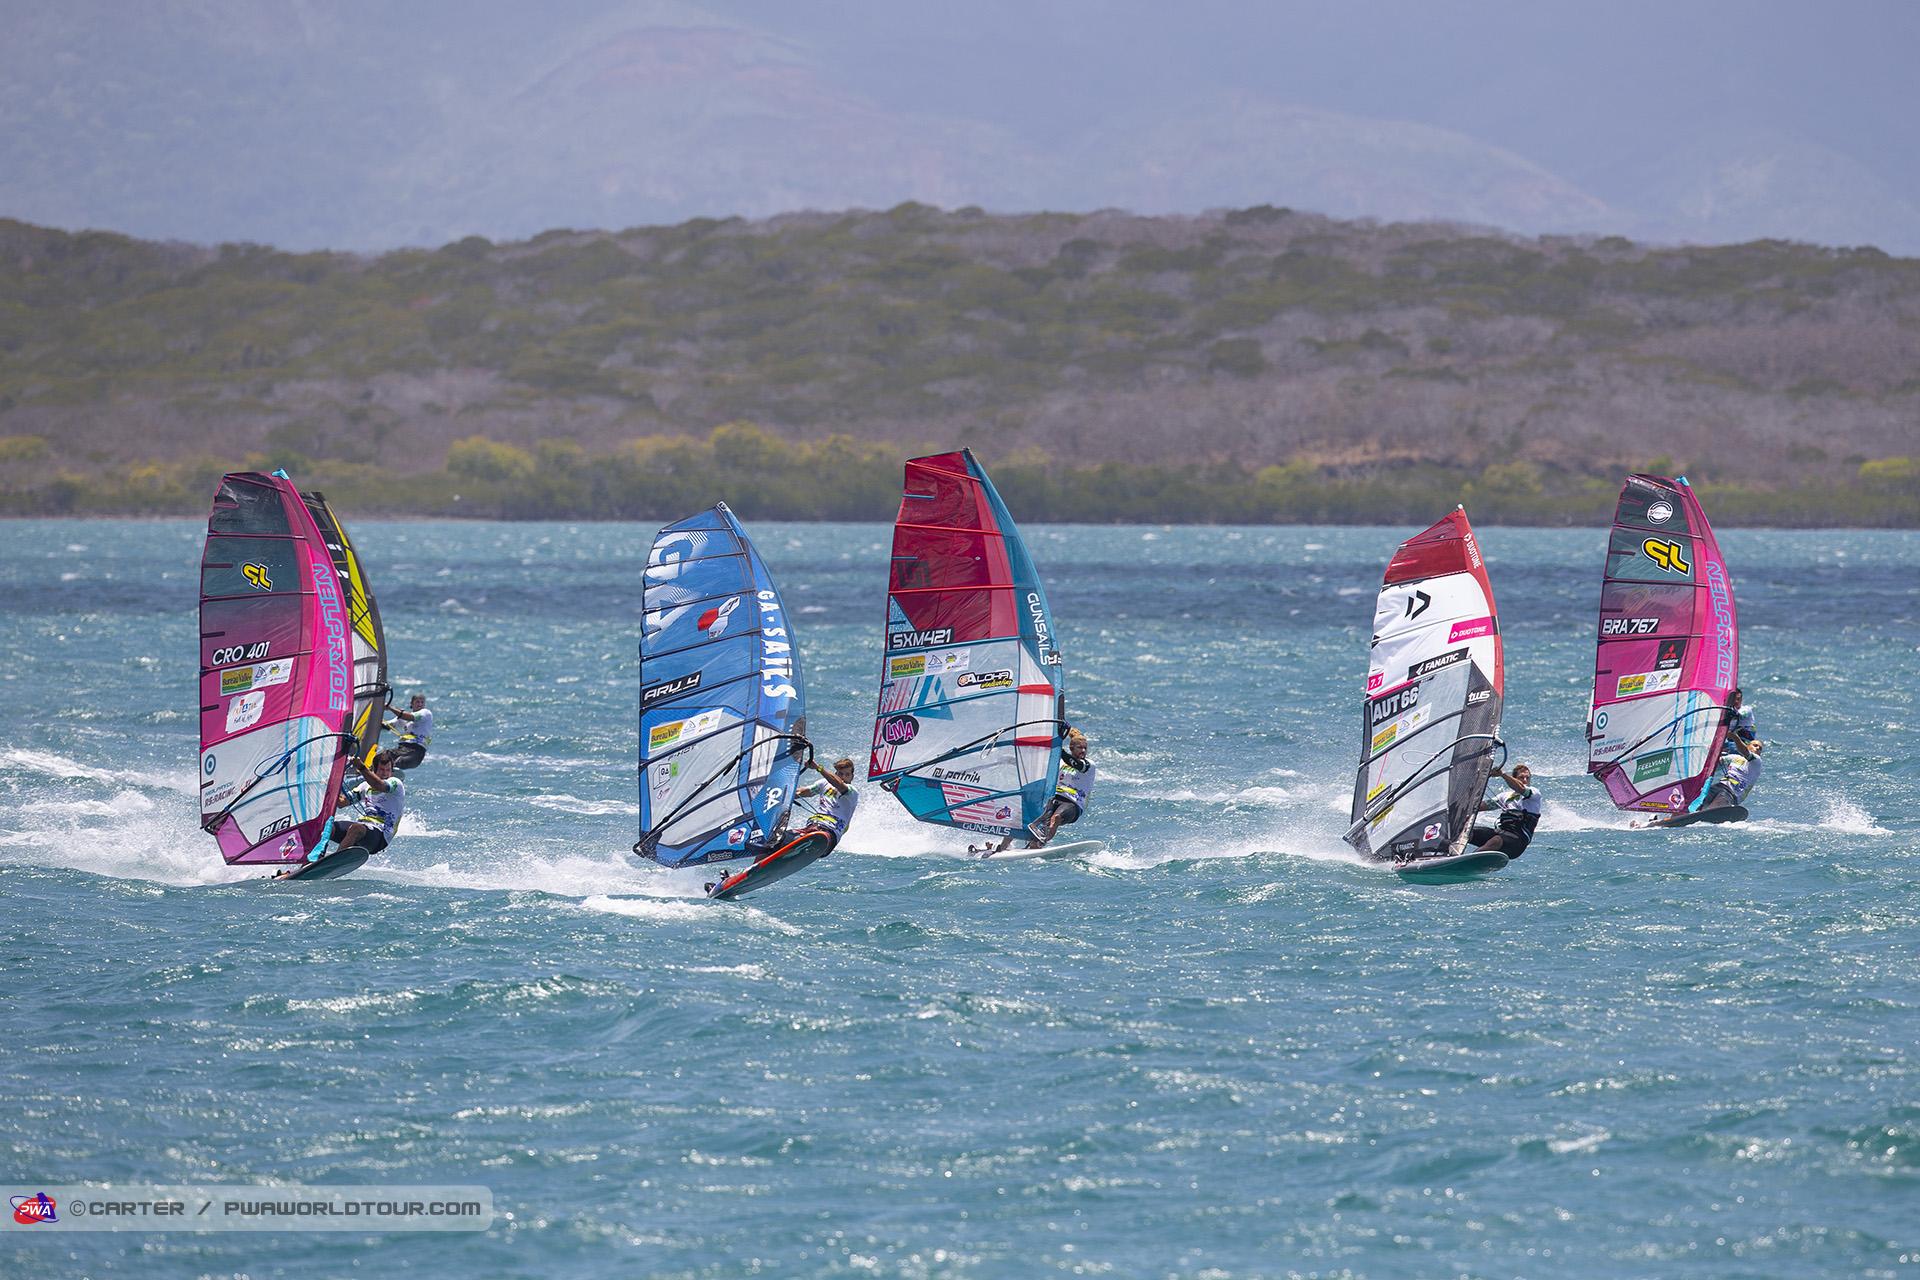 NC19_sl_Windy_slalom.jpg